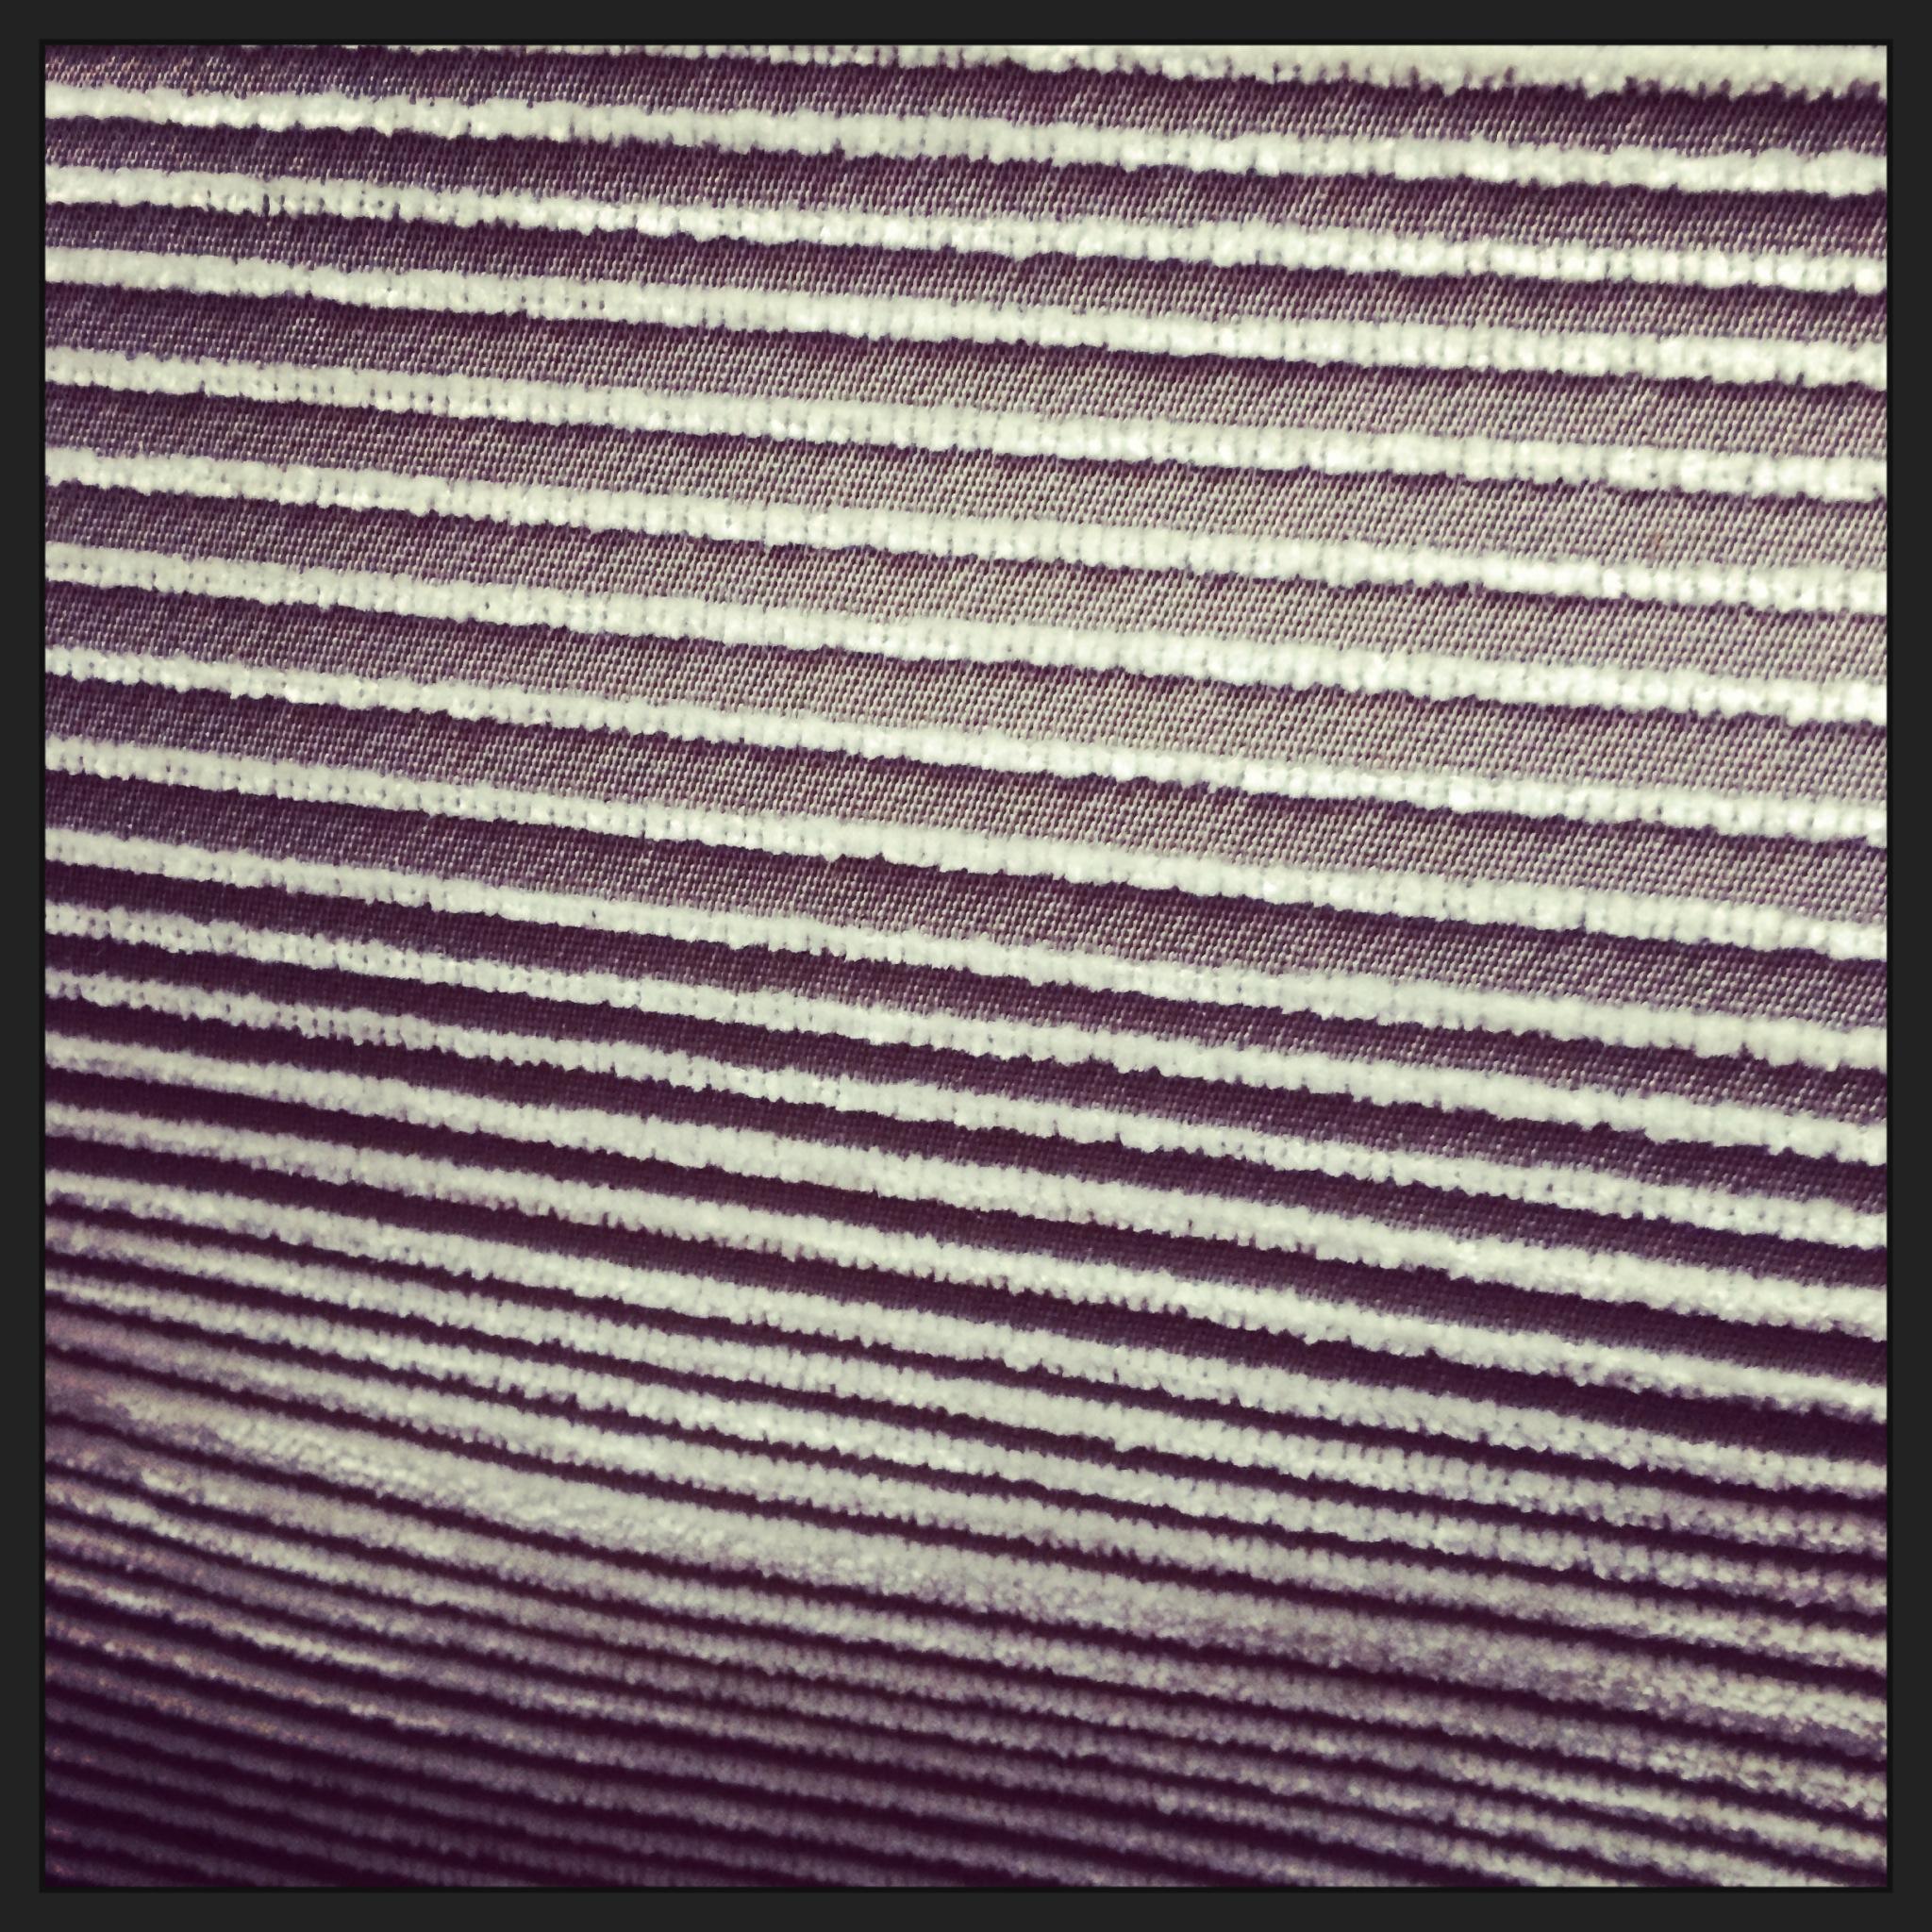 grayandcream-stripe-texture-fabric-asimplerdesign